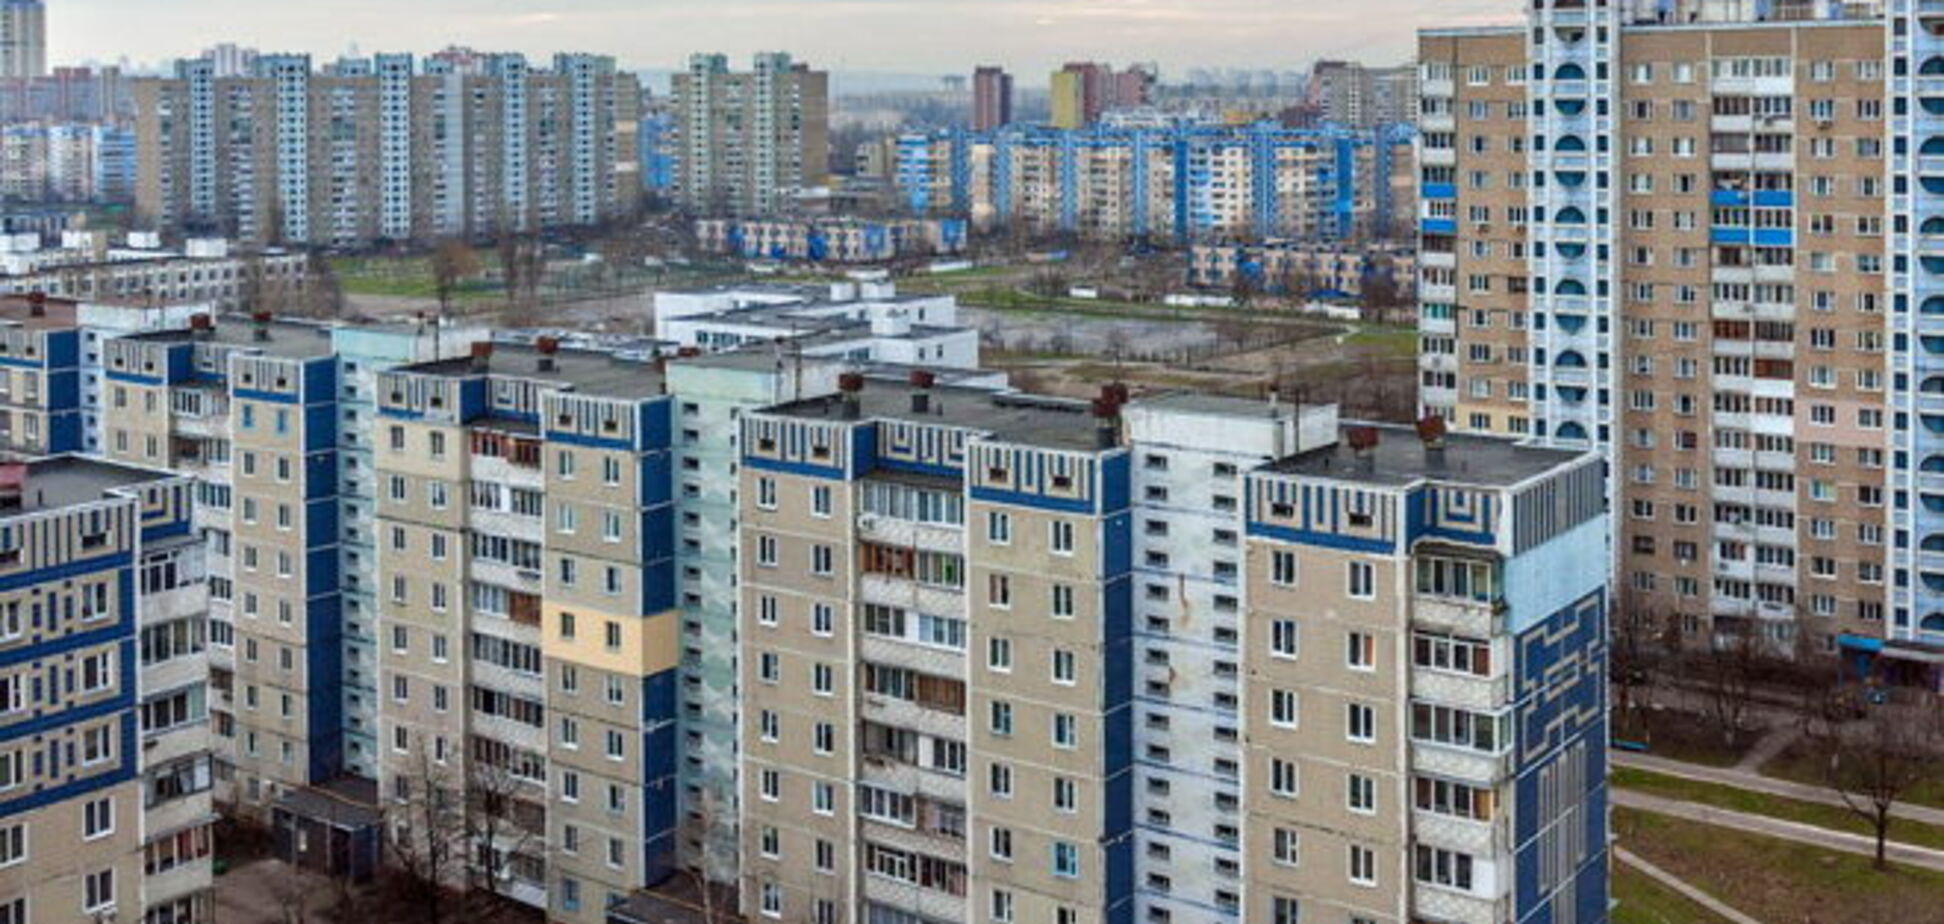 Аренда квартир в Киеве и области: цены и прогноз